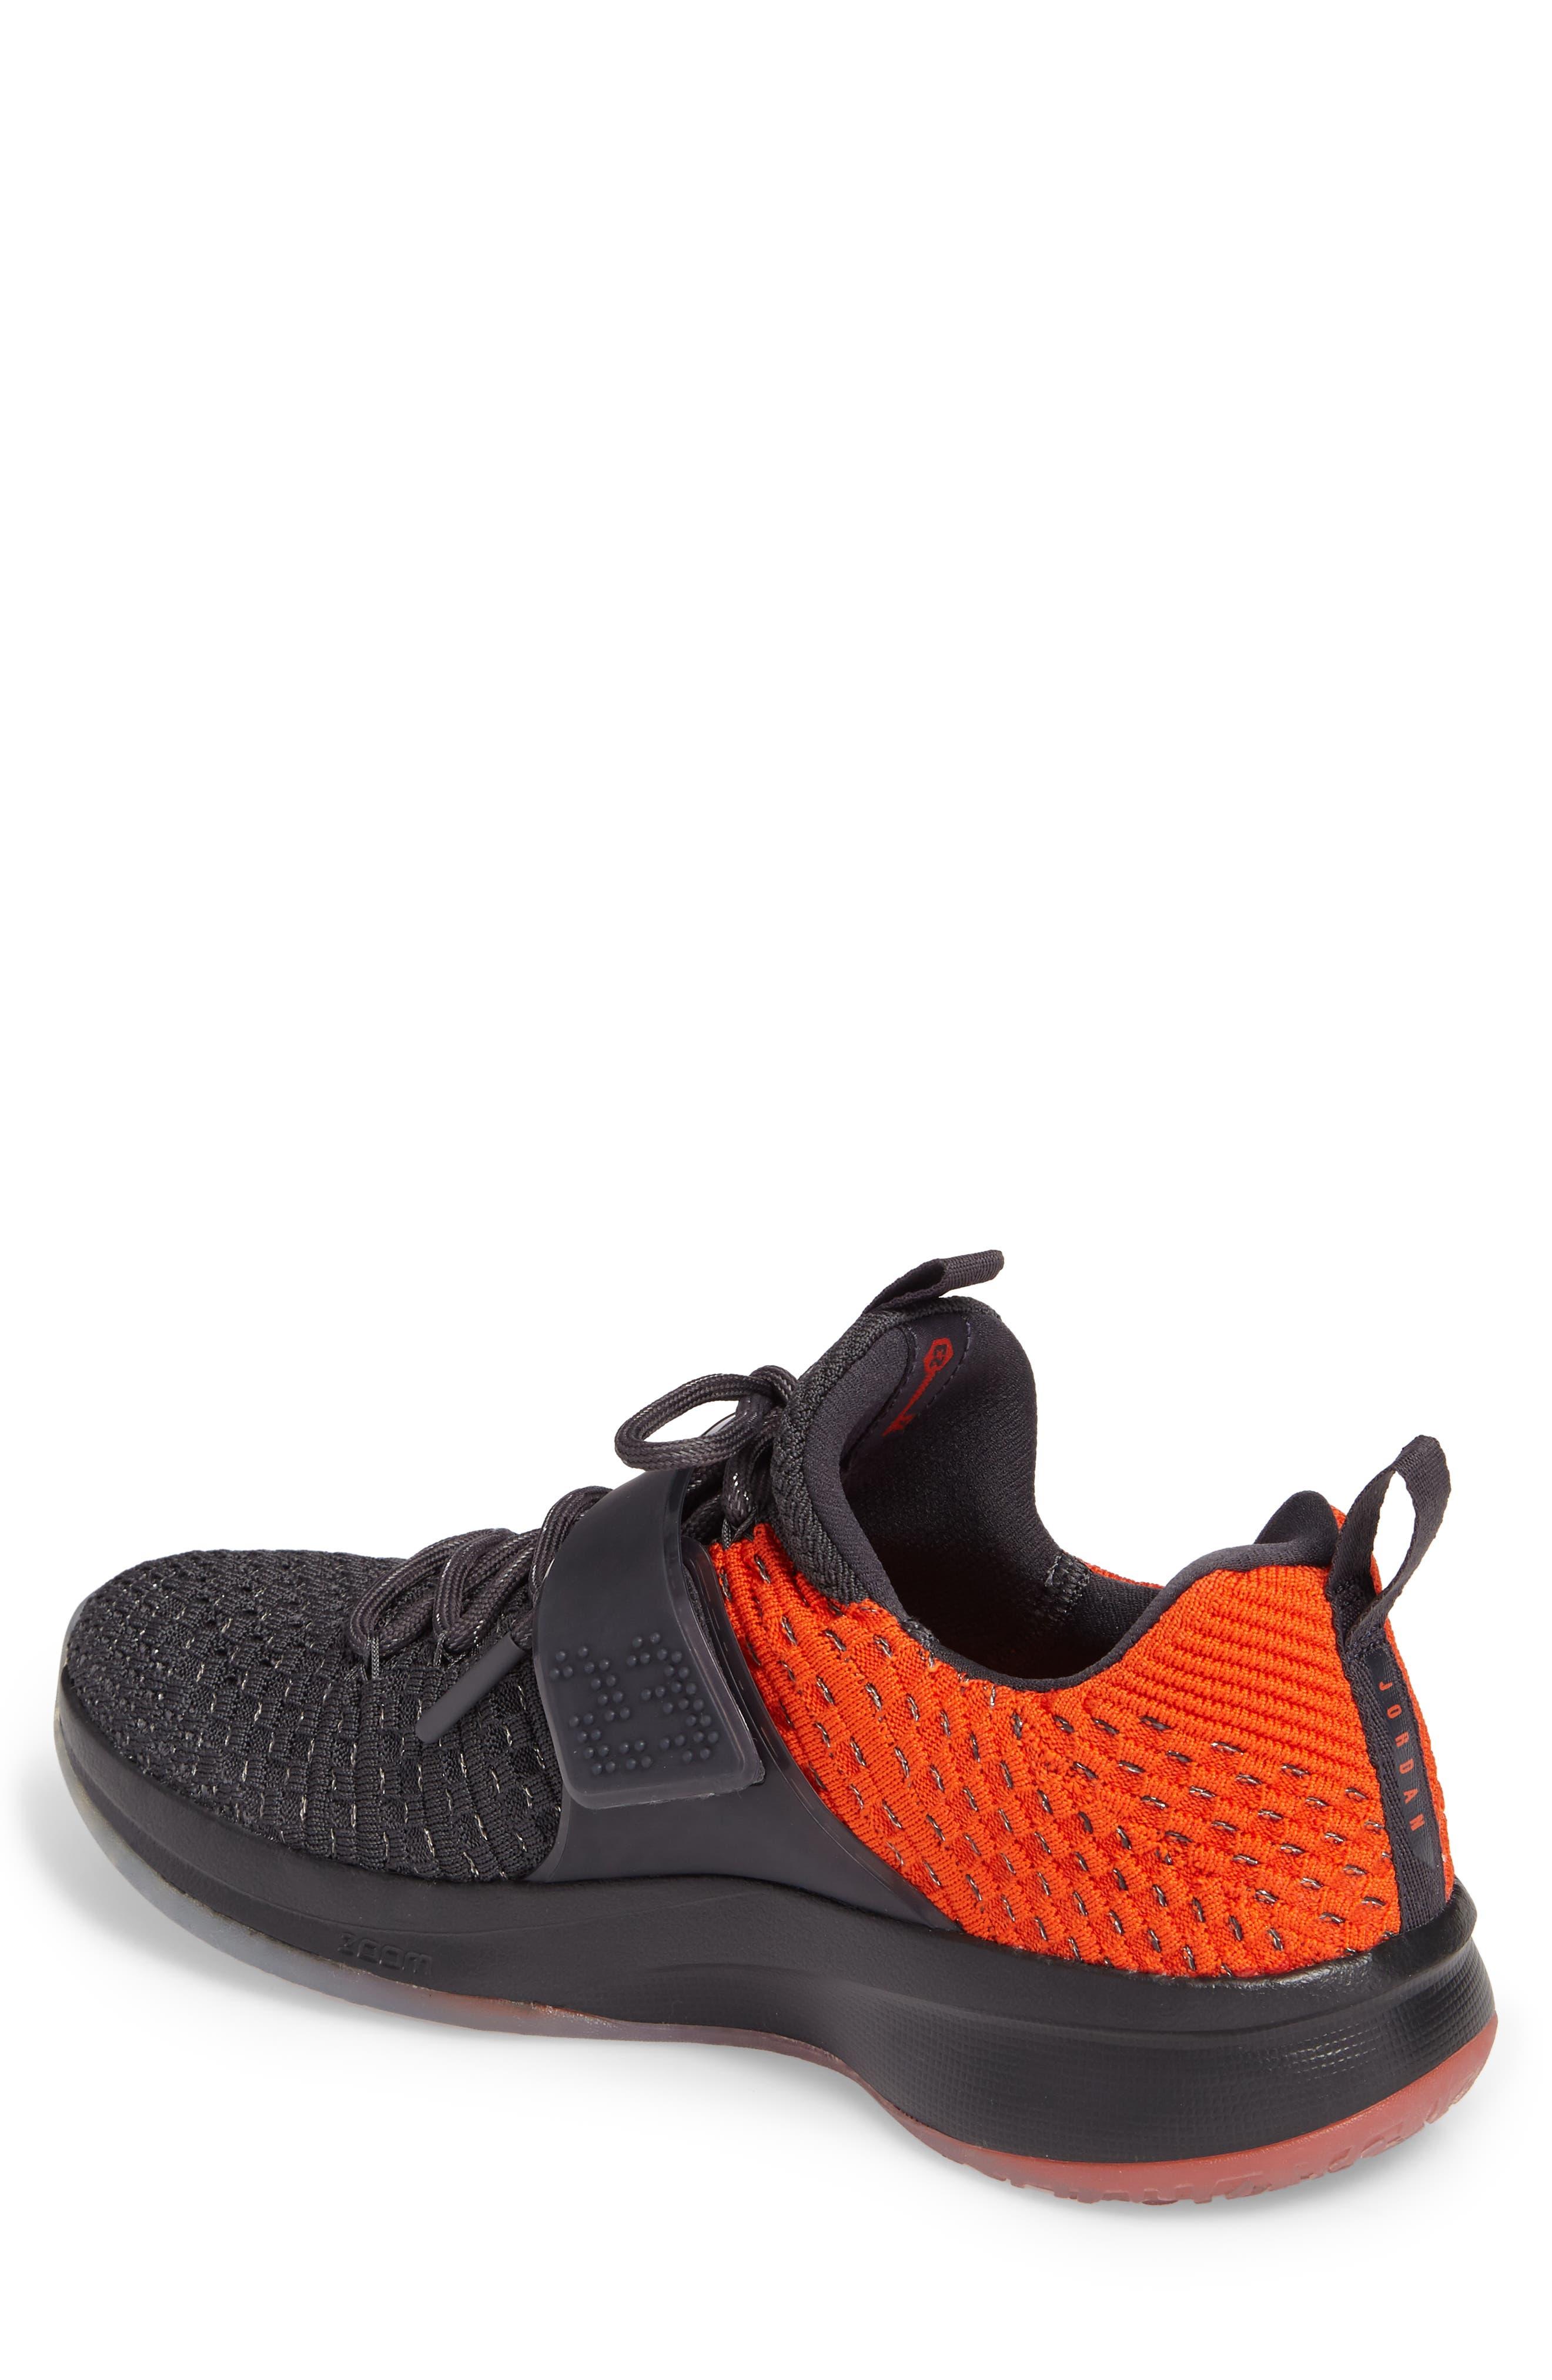 Jordan Flyknit Trainer 2 Low Sneaker,                             Alternate thumbnail 7, color,